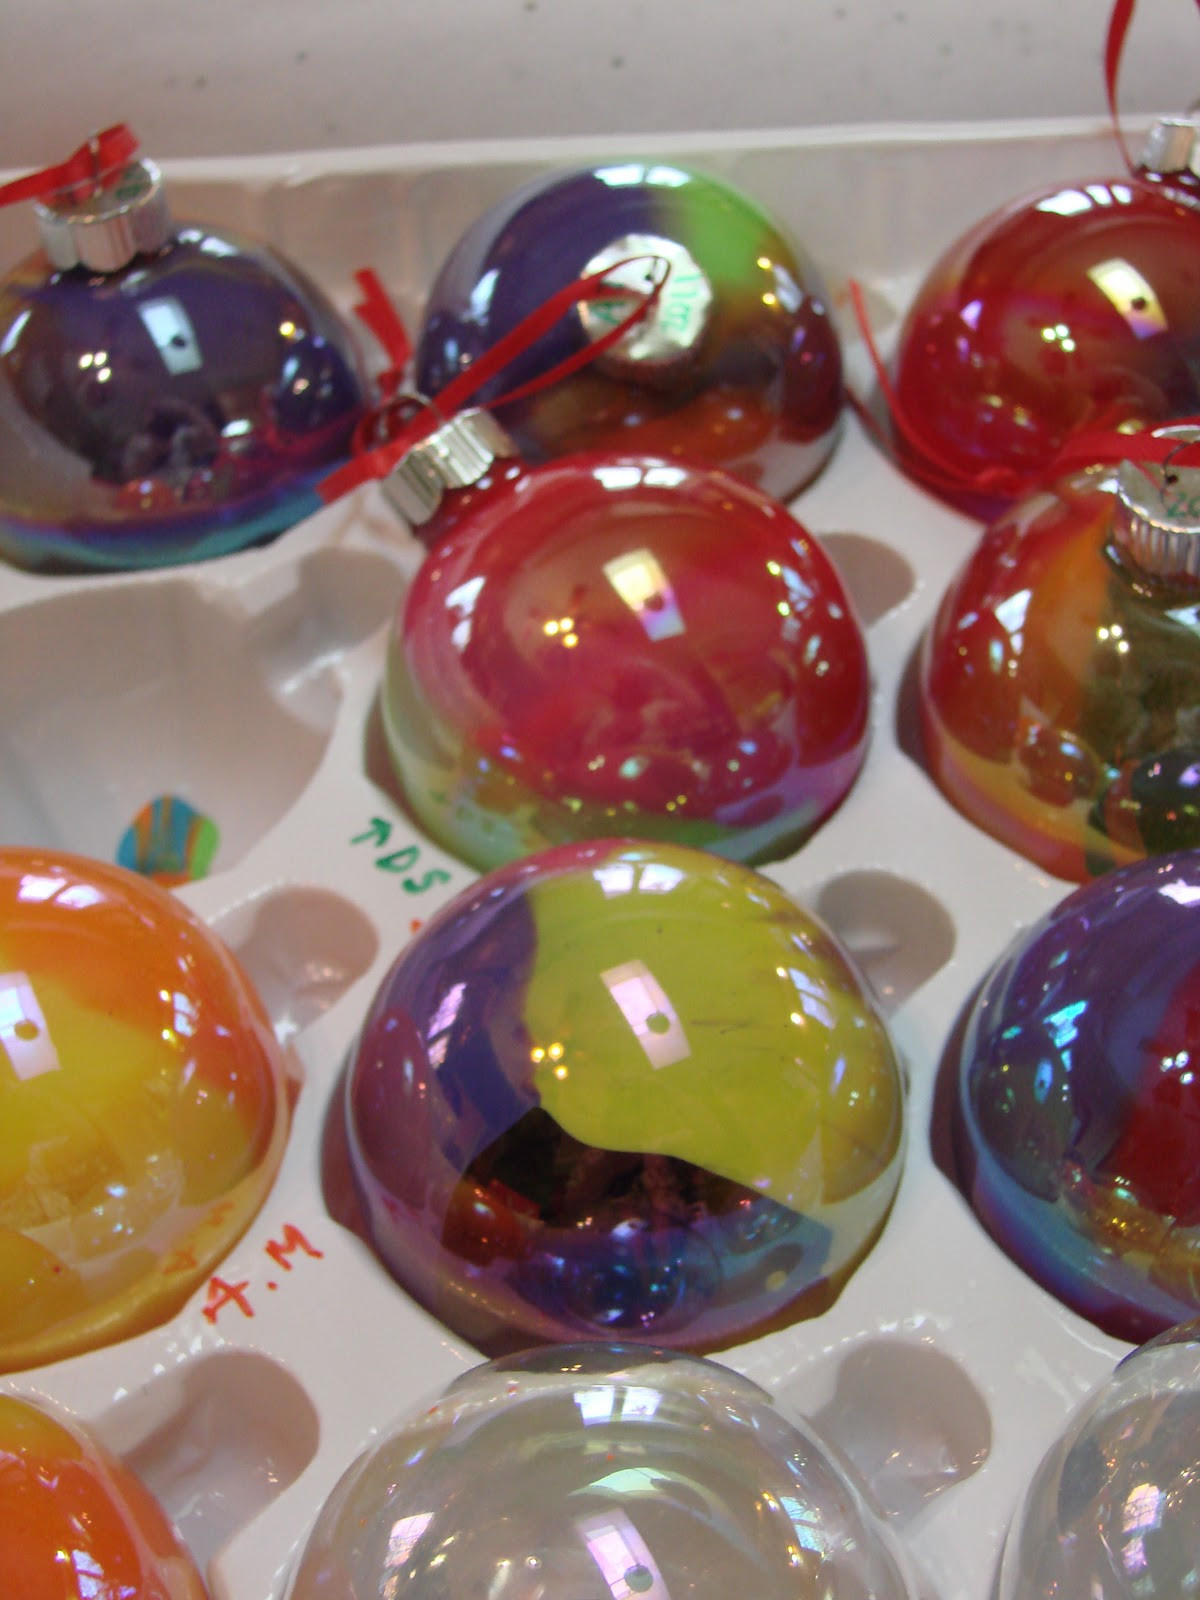 Christmas Craft Ideas For Preschoolers  Beautiful Chaos Preschool Christmas Crafts